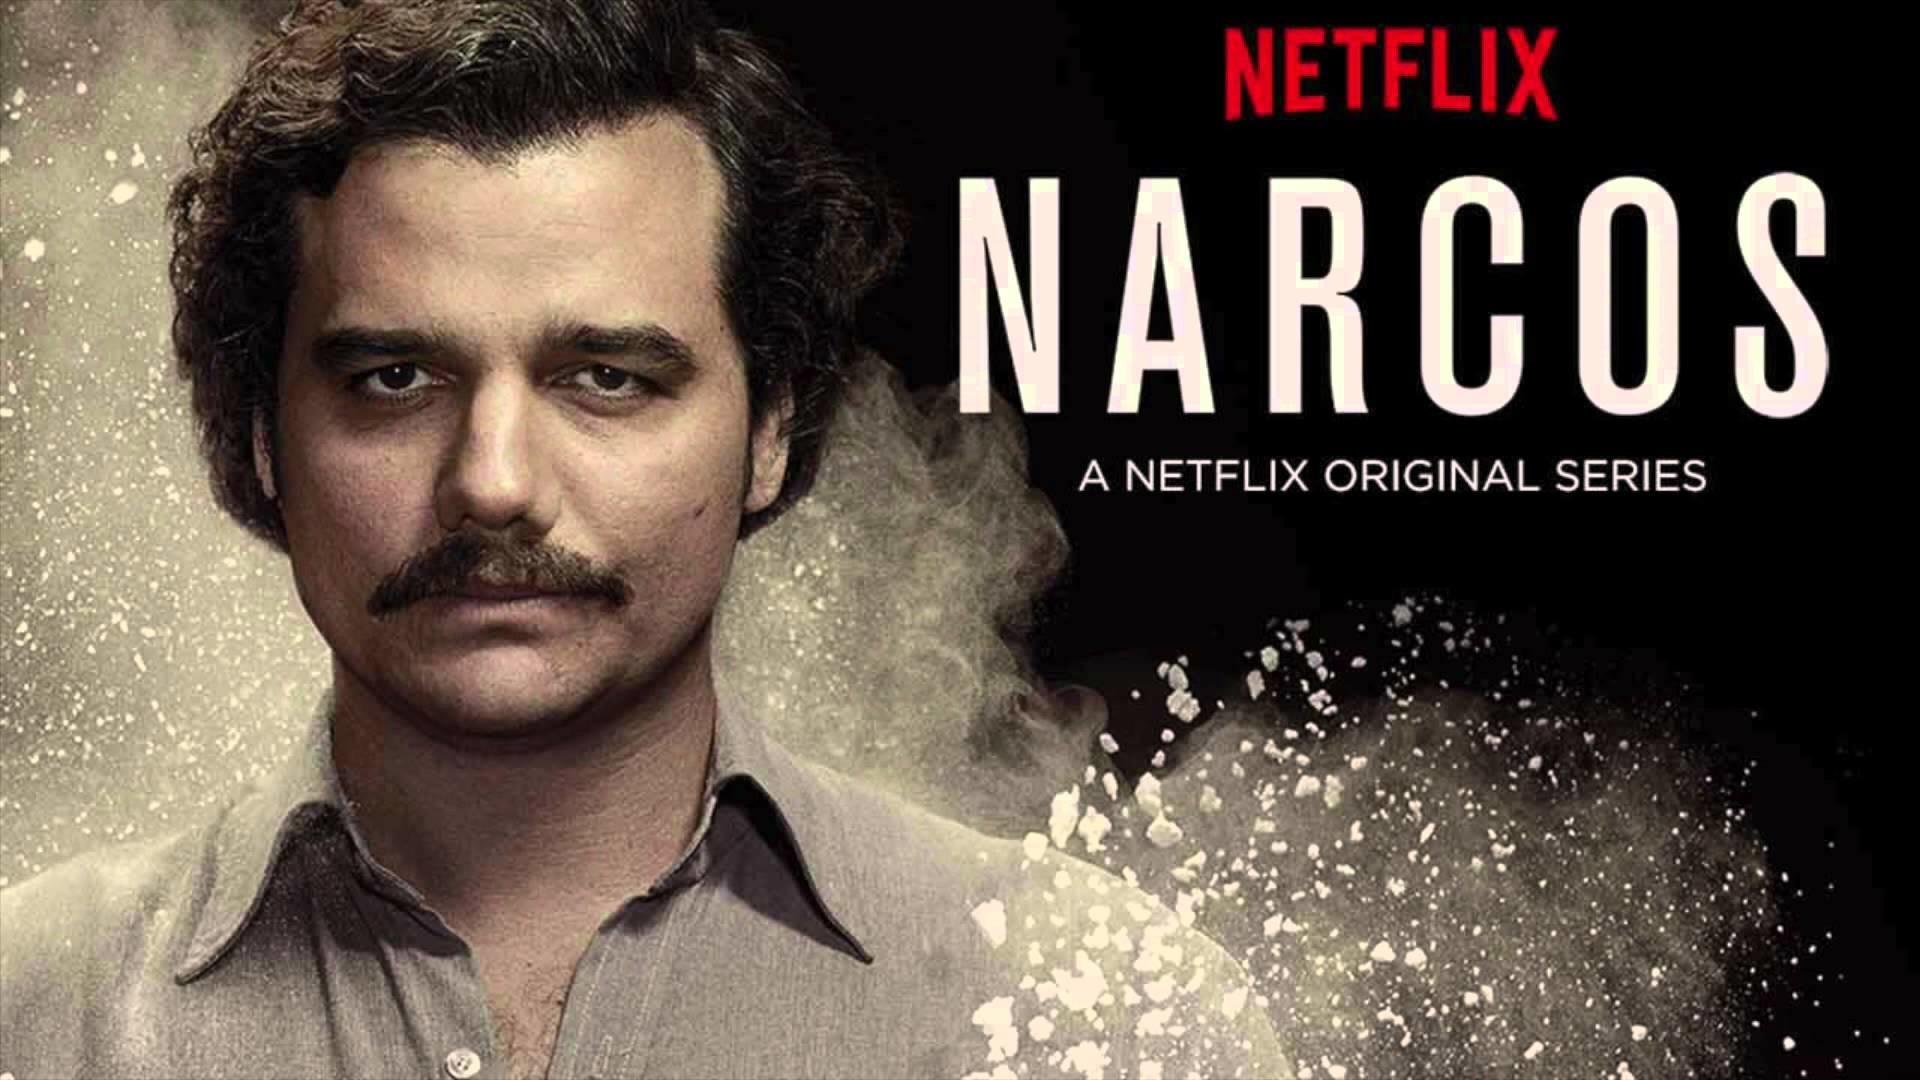 Narcos ultra hd wallpaper